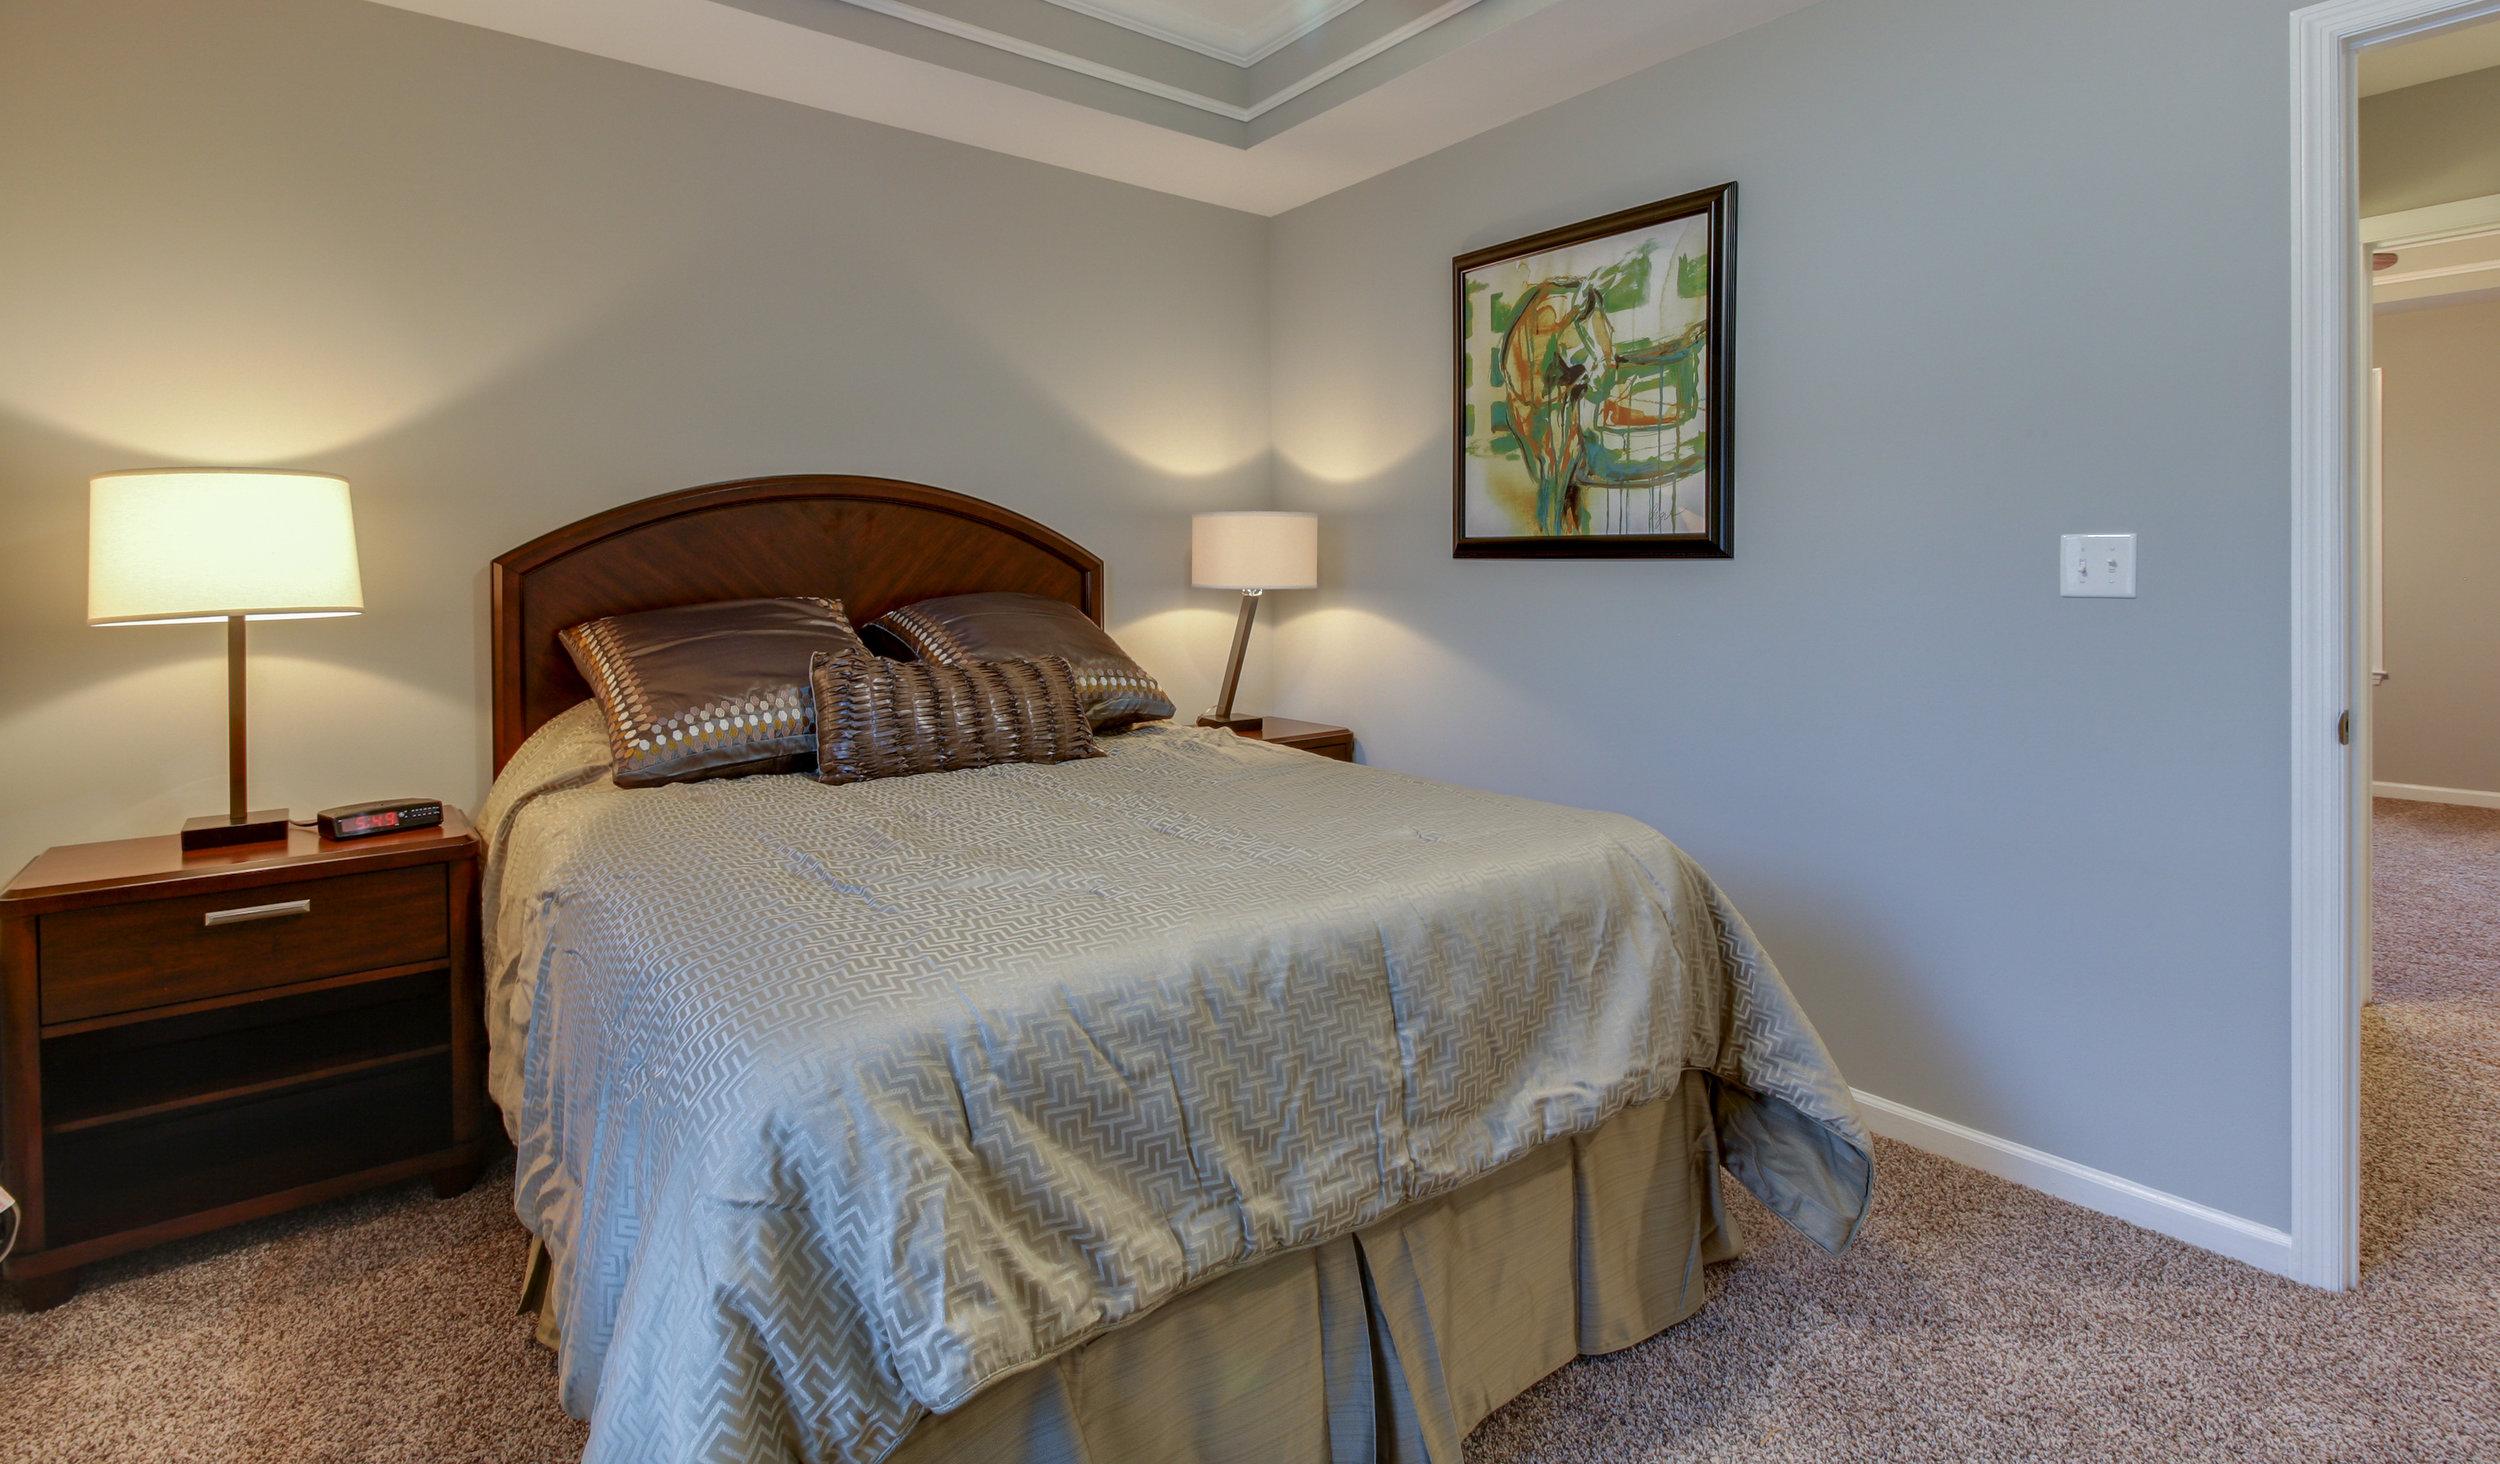 Davis Park Smyrna Bedroom 2 - Copy.jpg